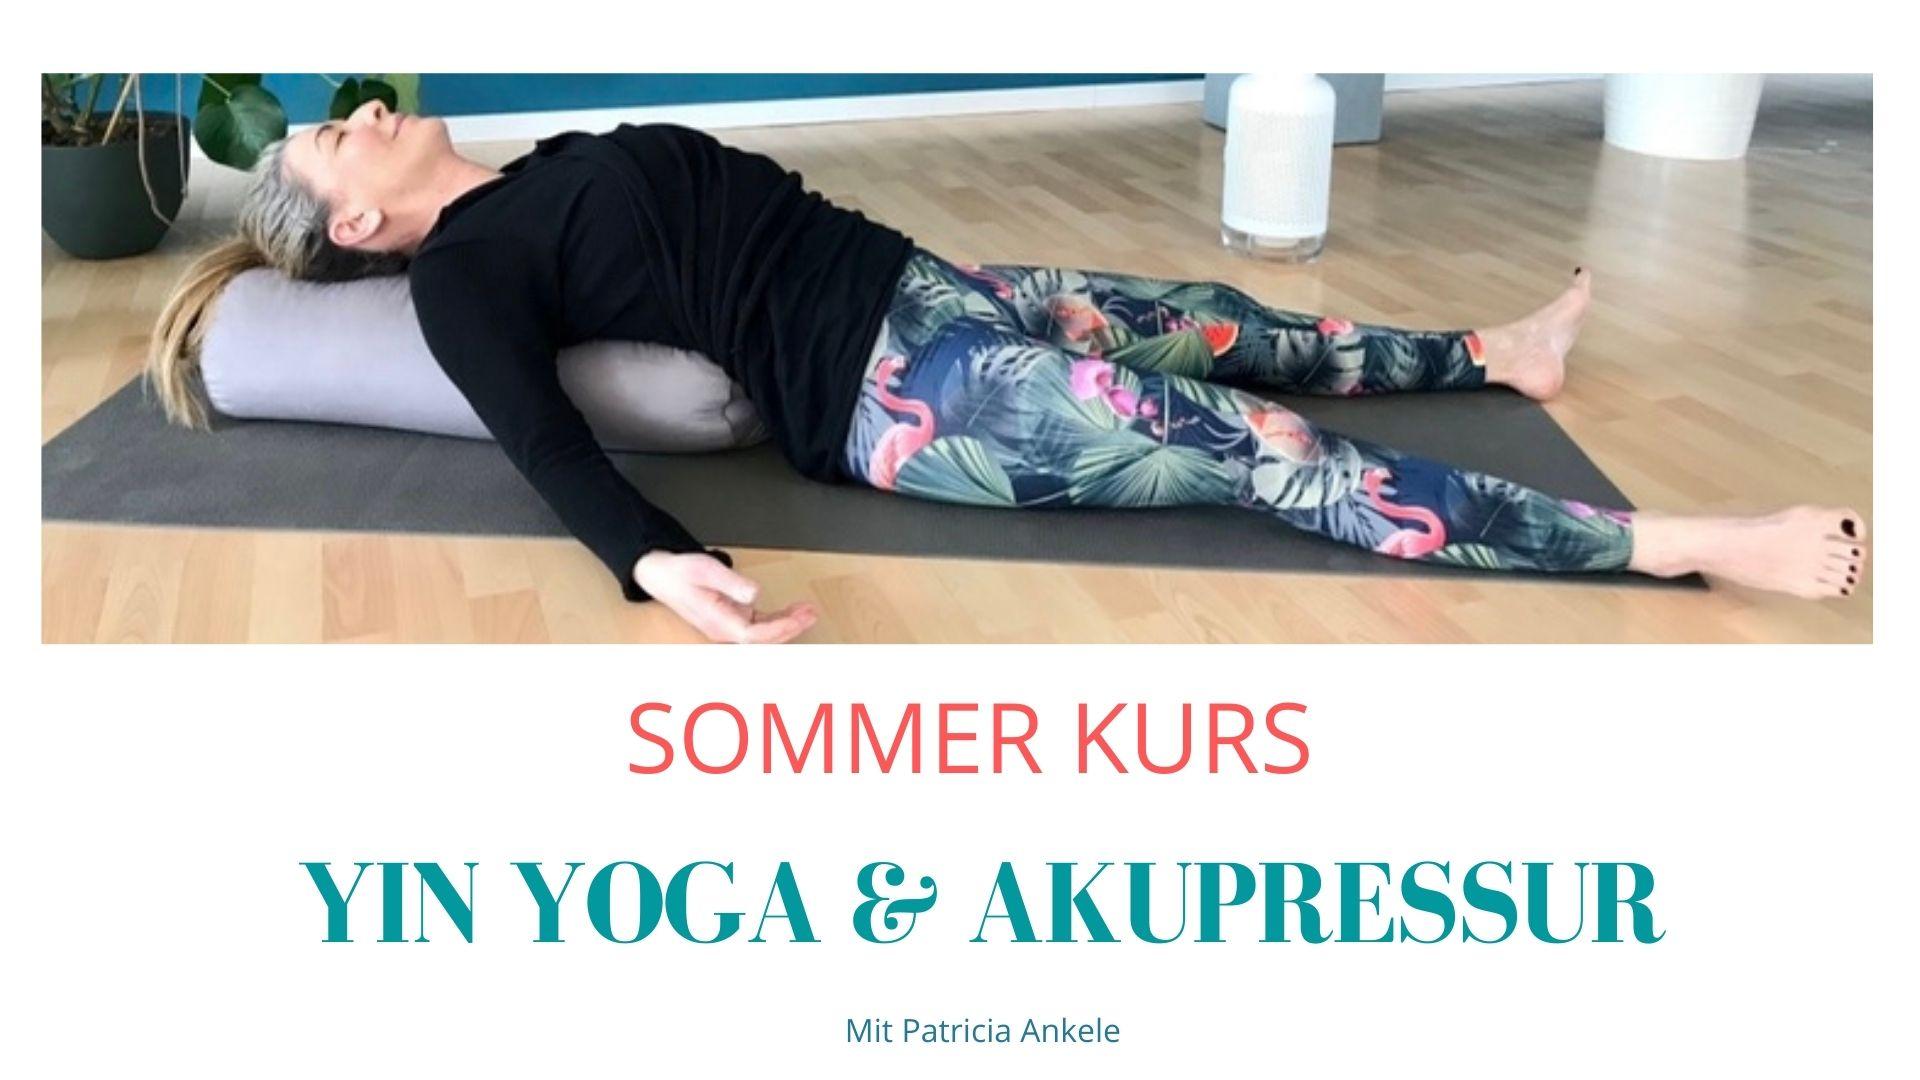 Sommerkurs: Yin Yoga und Akupressur